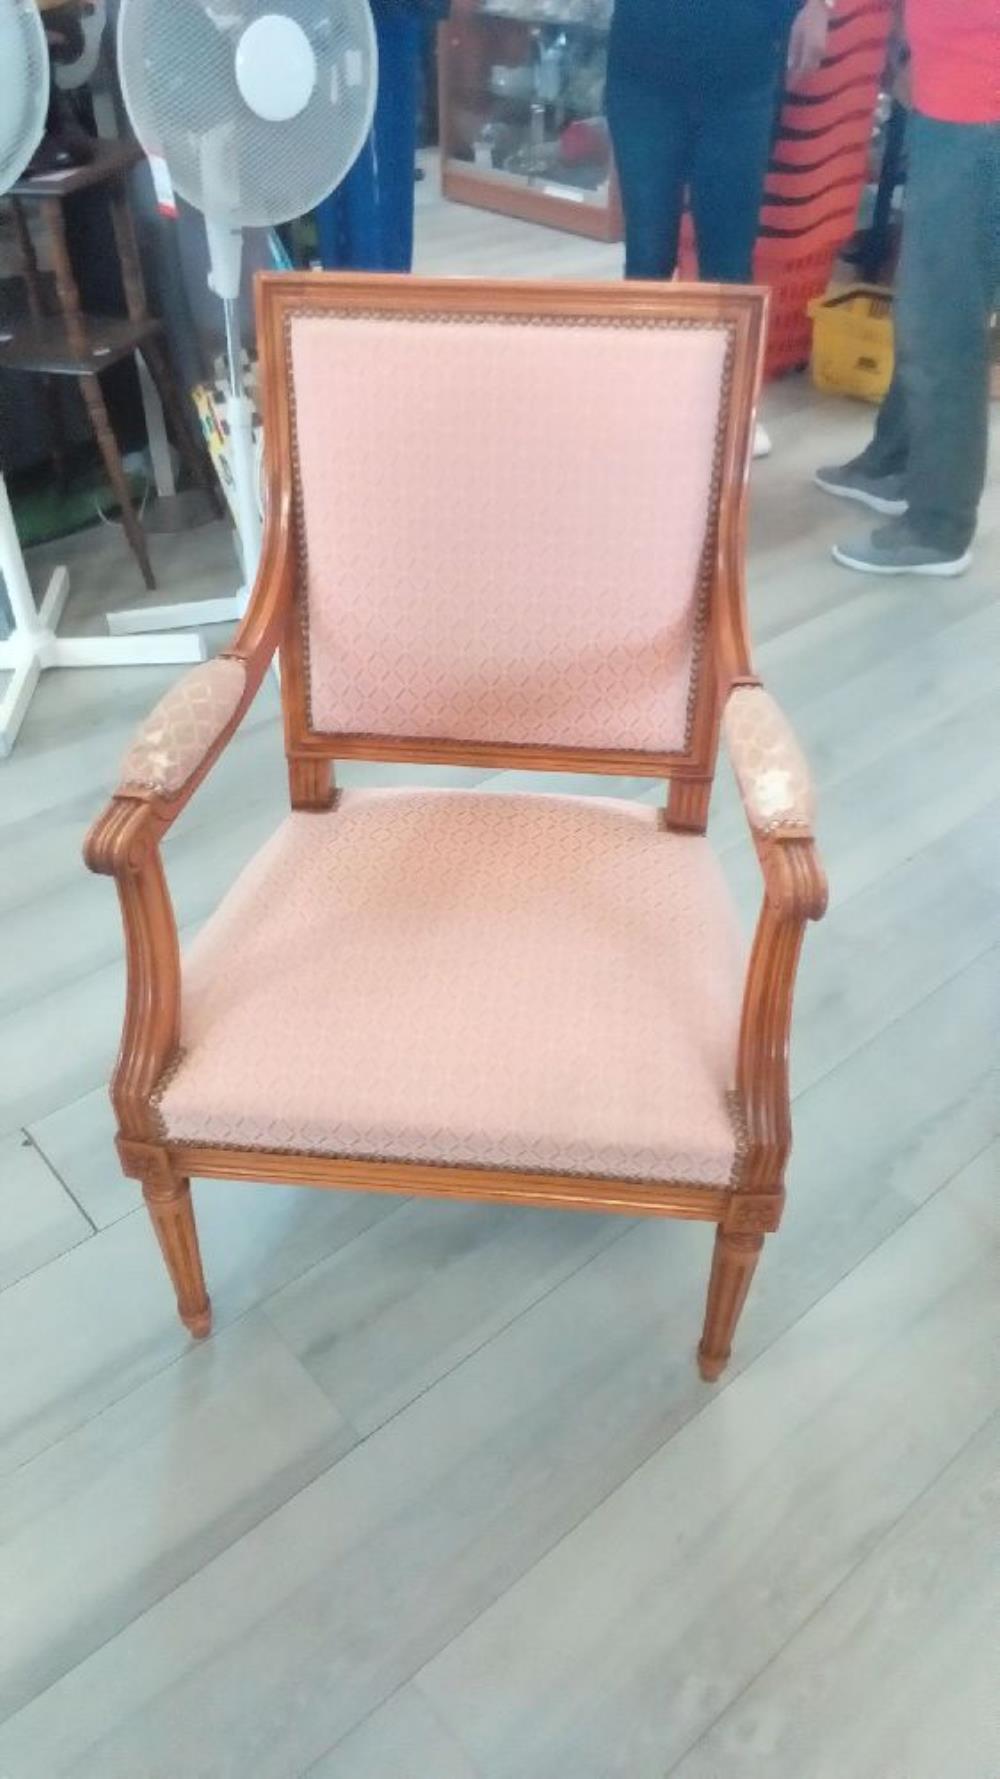 fauteuil l xvi a restaurer occasion troc richwiller. Black Bedroom Furniture Sets. Home Design Ideas